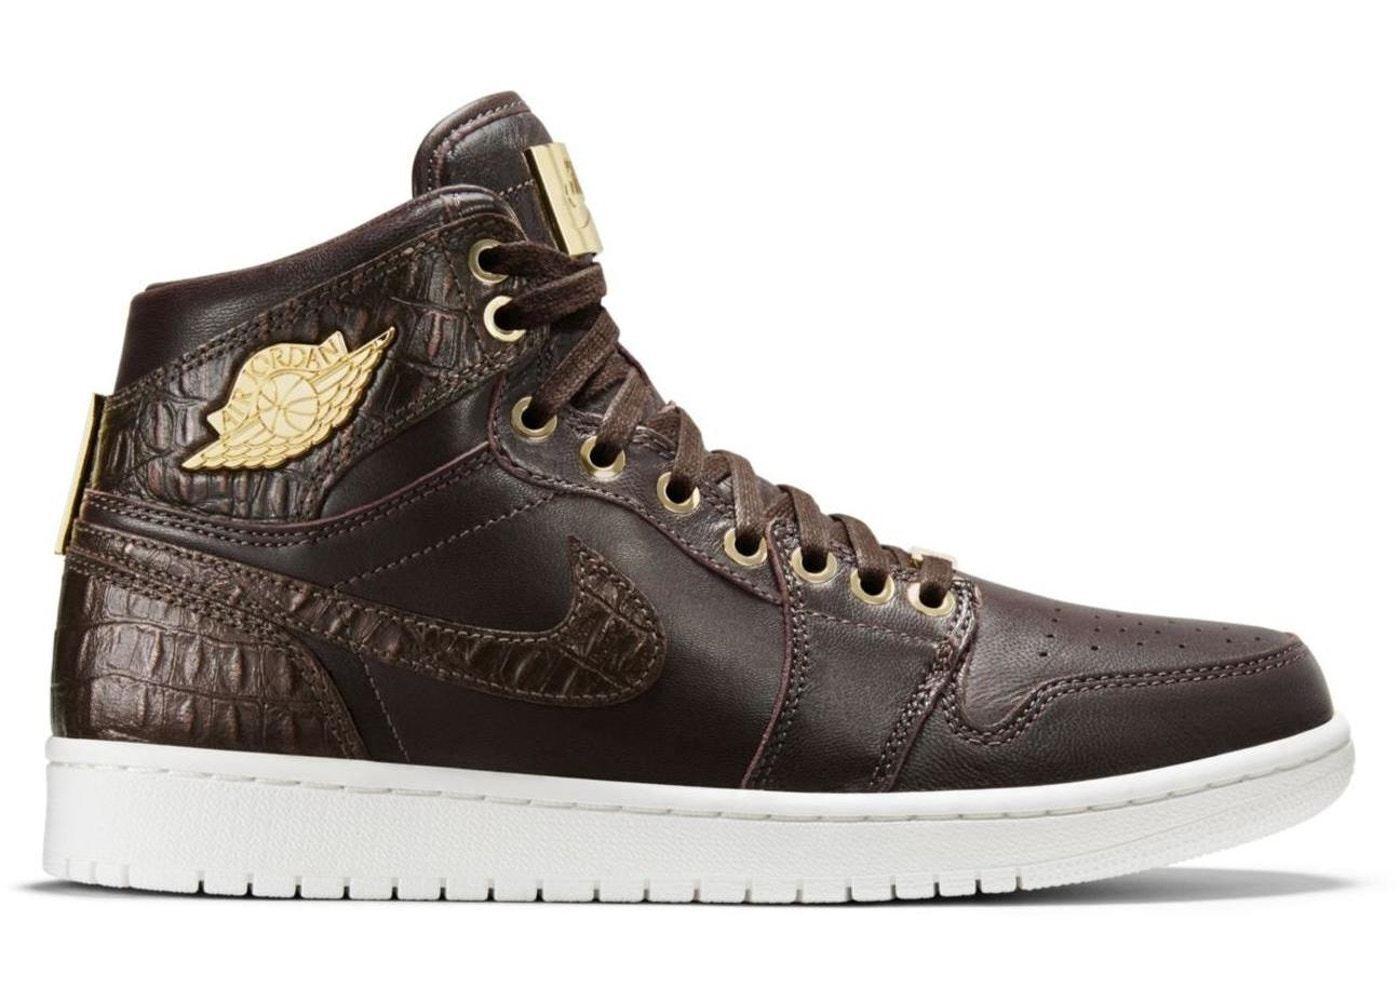 NIKE Air Jordan 1 Pinnacle 'Baroque Brown' - Size 8.5 (705075-205)